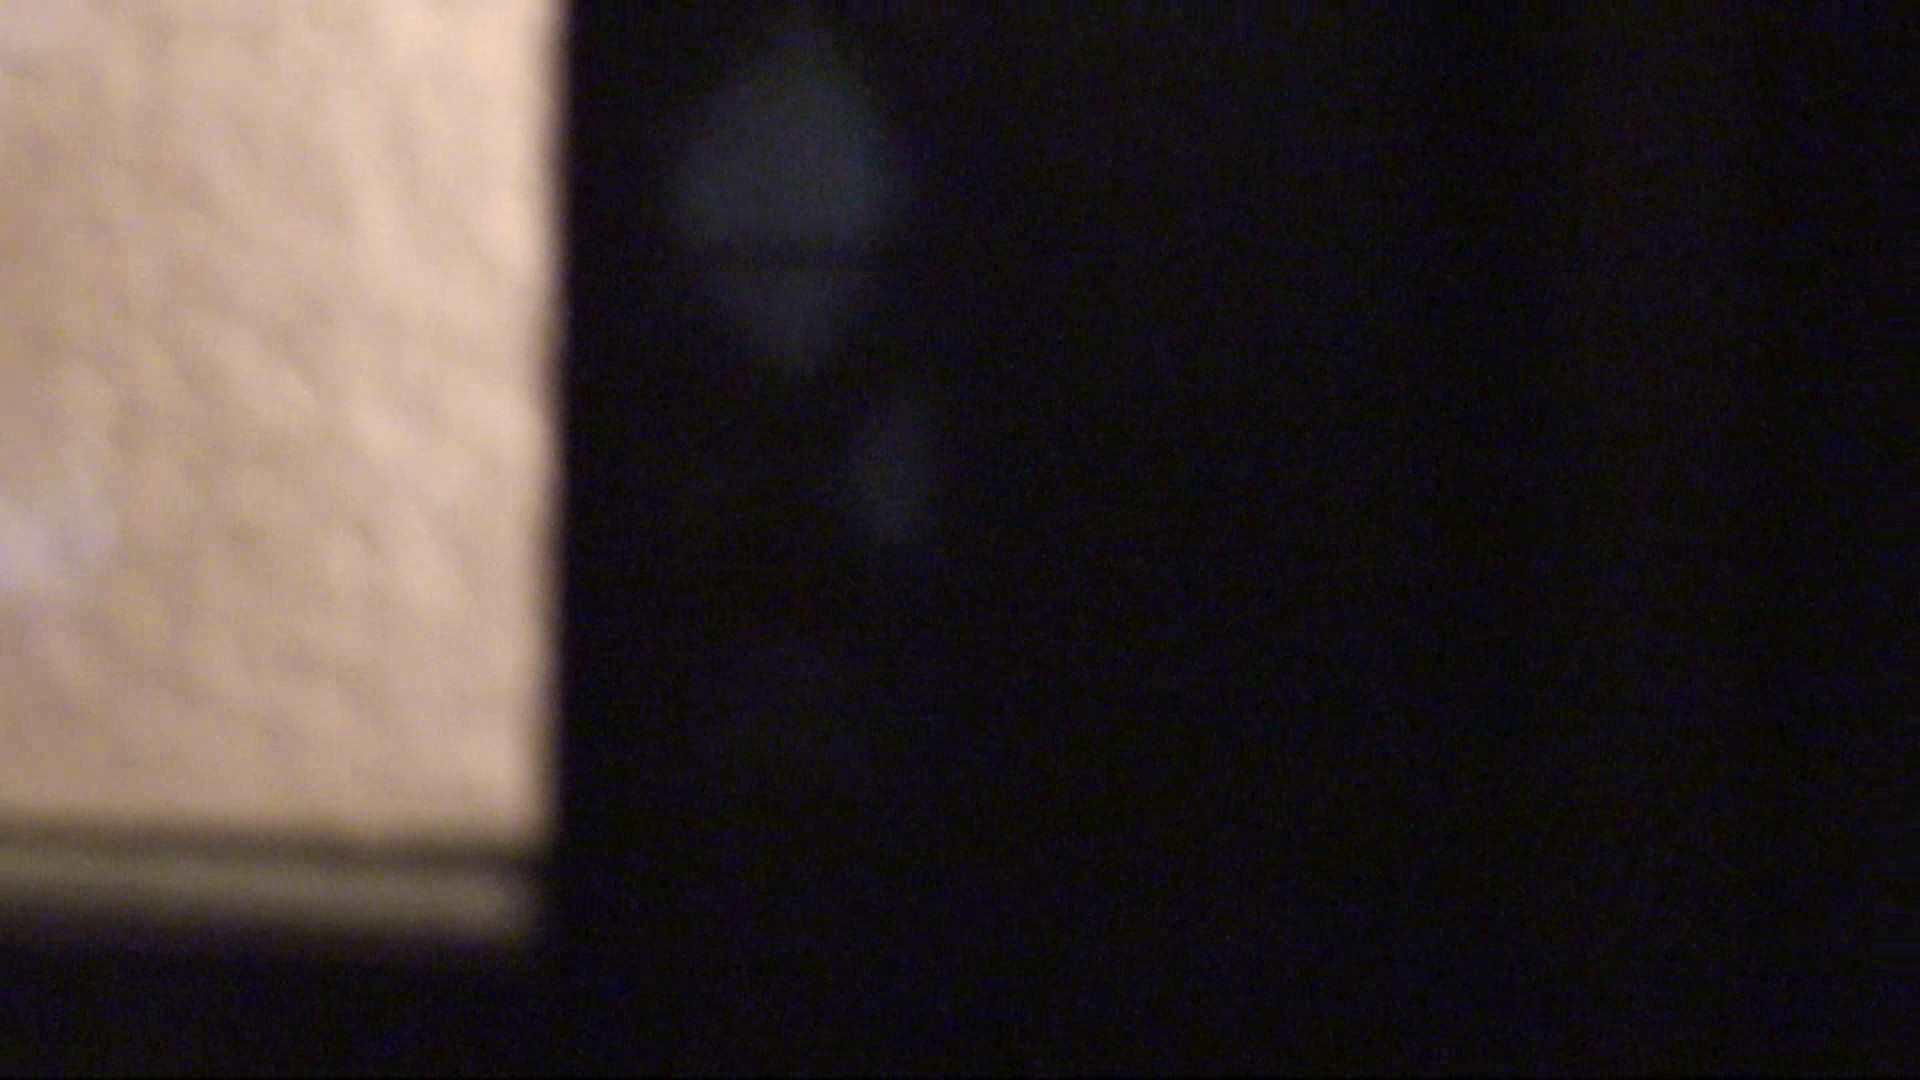 vol.01必見!白肌嬢の乳首が丸見え。極上美人のすっぴん顔をハイビジョンで! 丸見え おめこ無修正動画無料 71画像 12